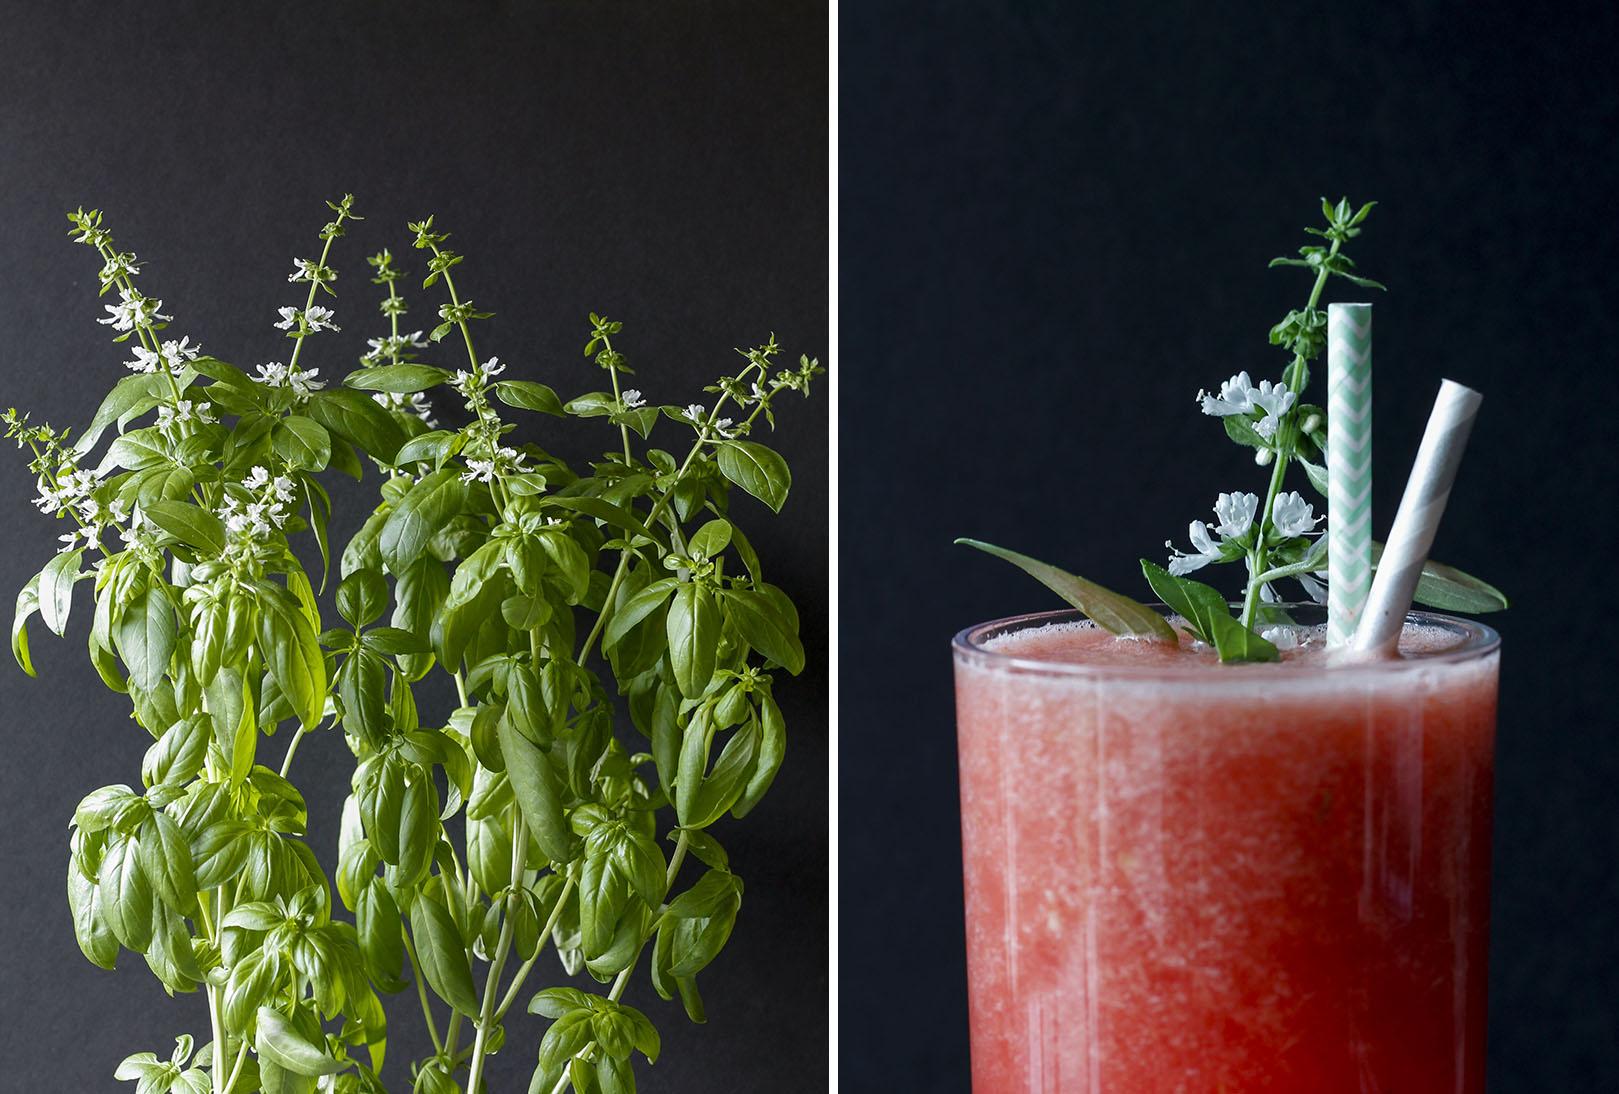 Spicy Watermelon Juice with Basil Sprig | roux studio